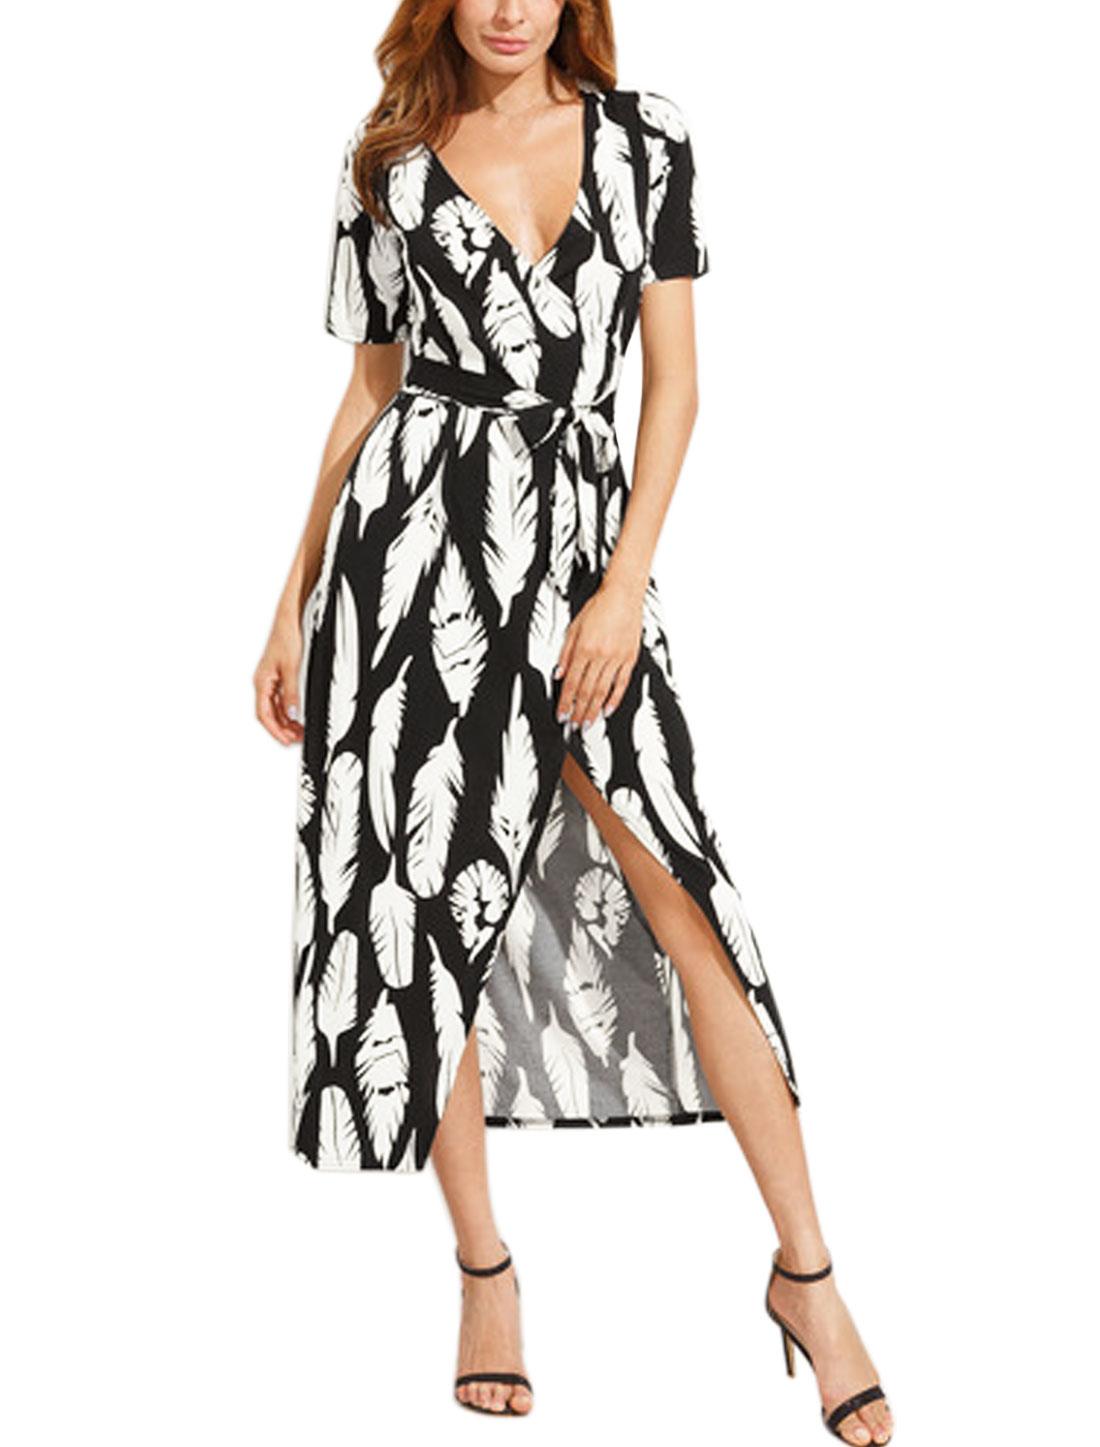 Women Crossover V Neck Feather Prints Midi Wrap Dress w Belt White Black M